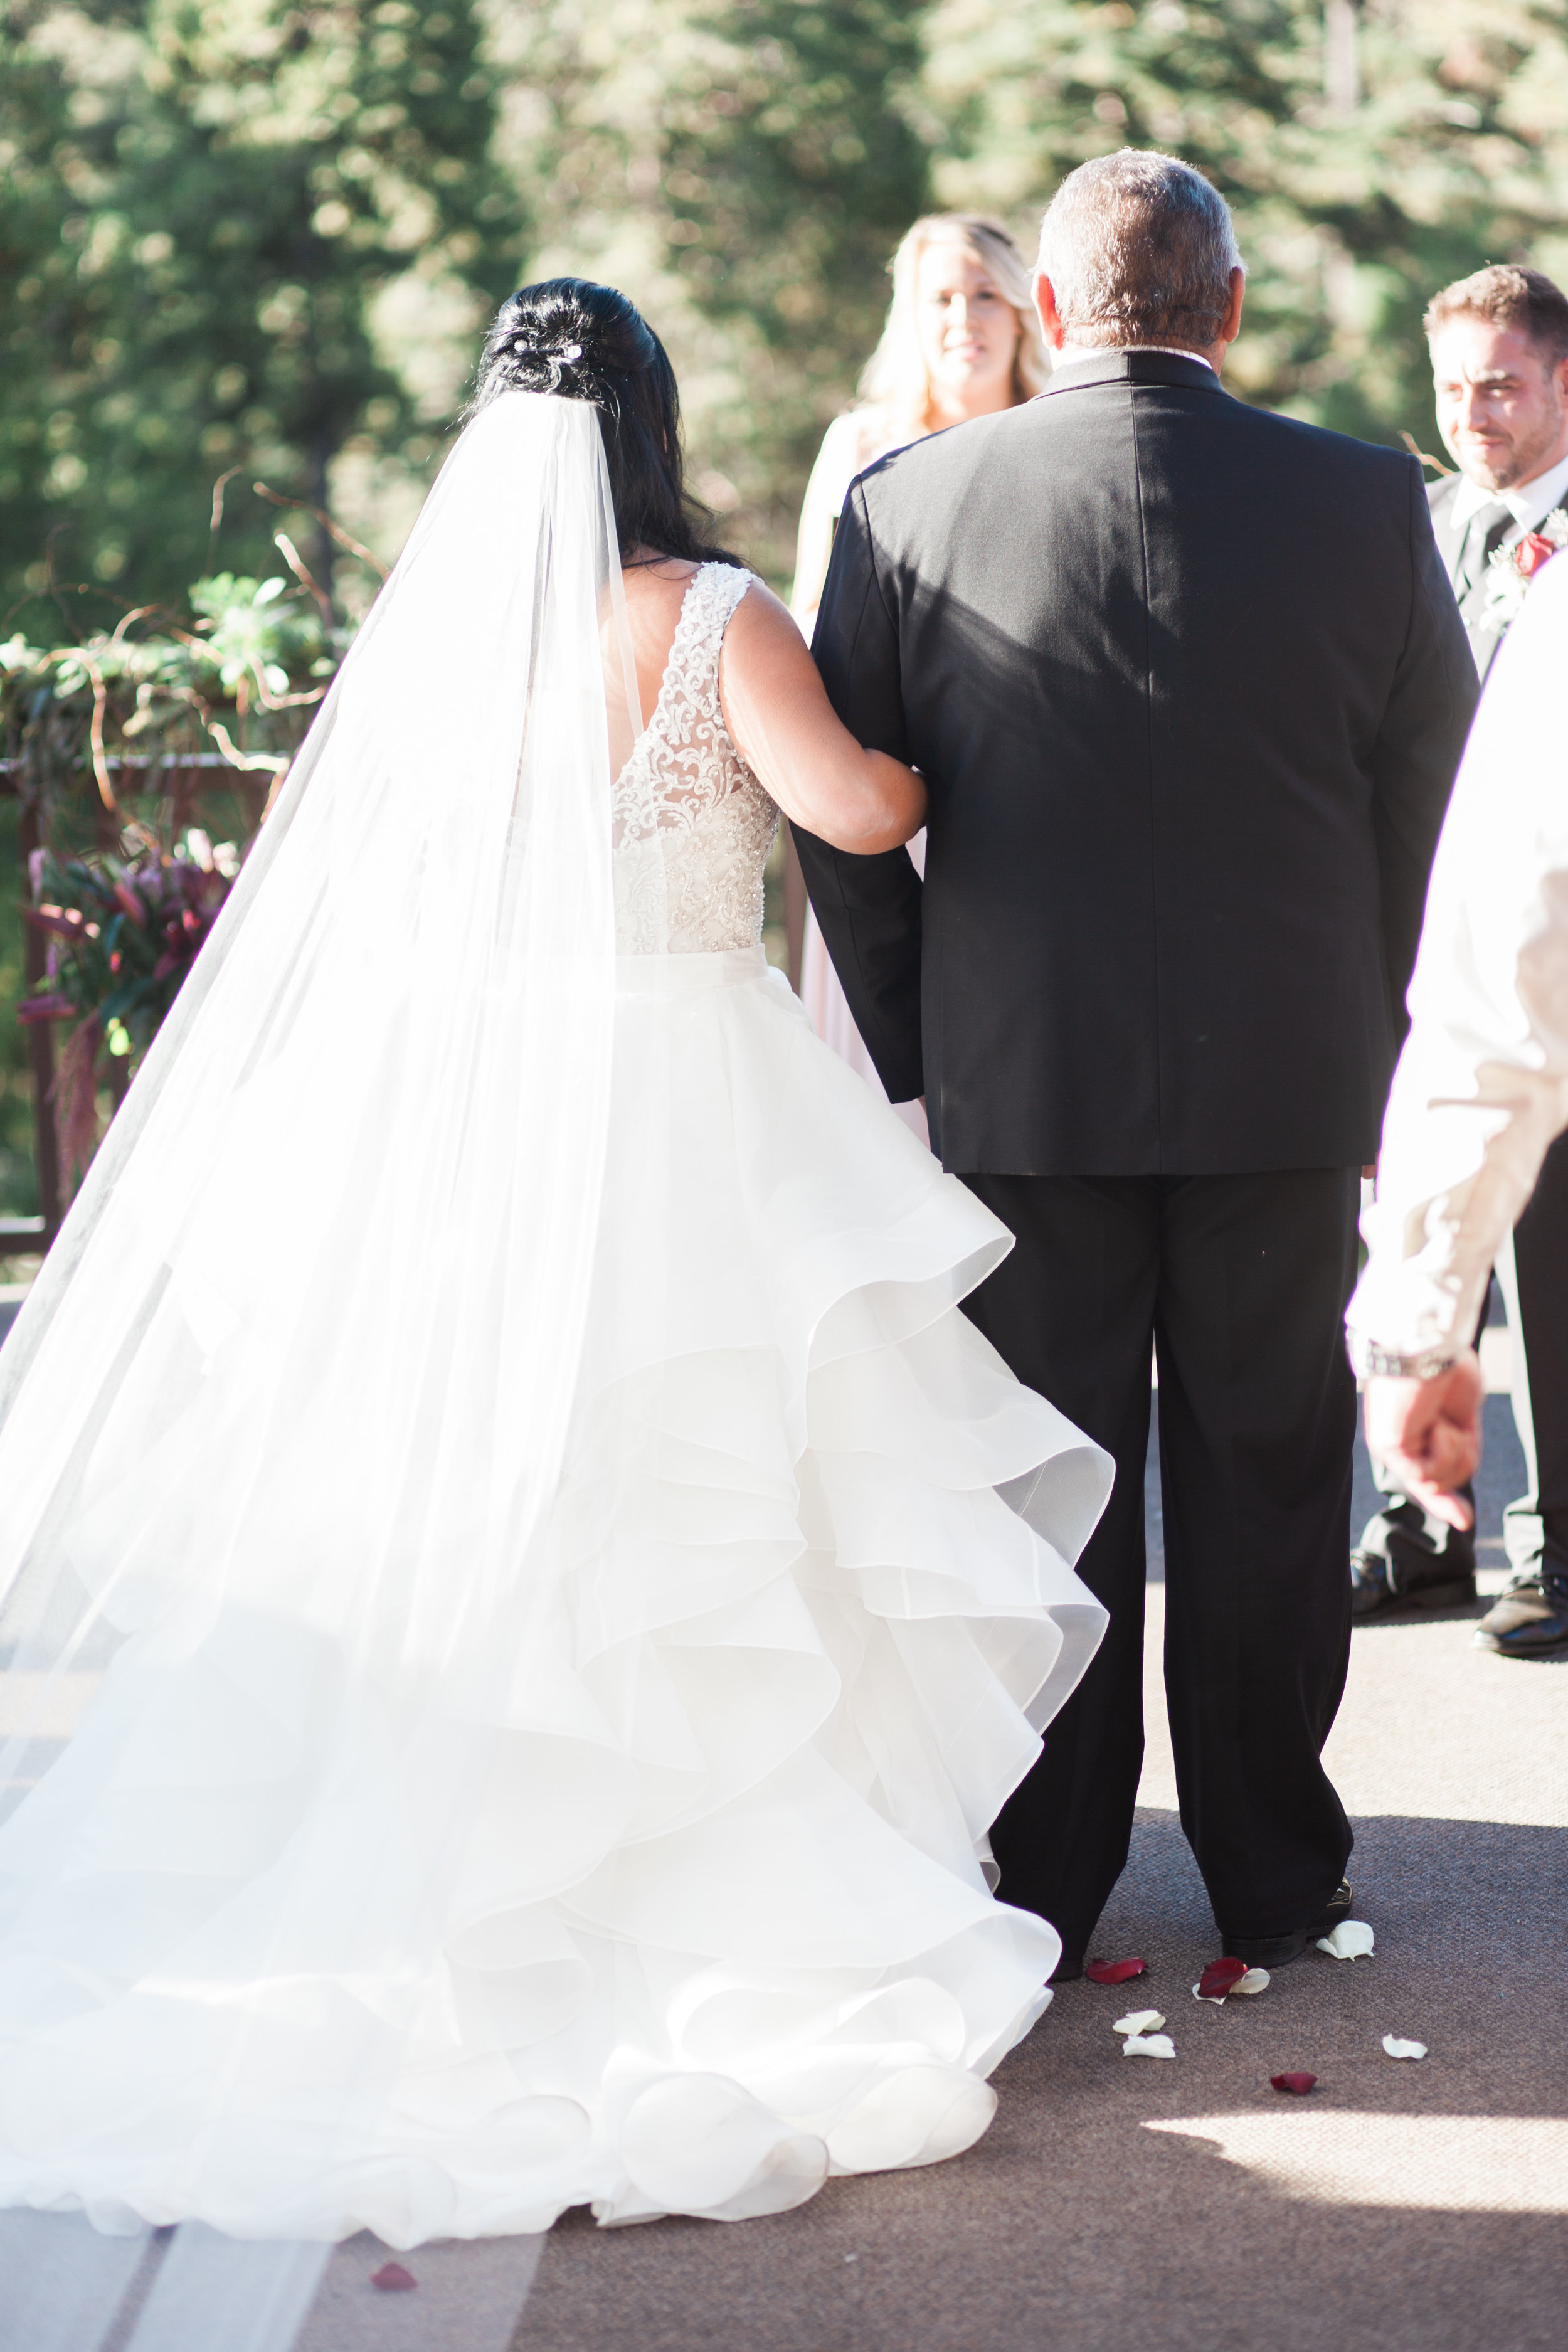 Yosemite-wedding-at-Tenaya-lodge-12.jpg